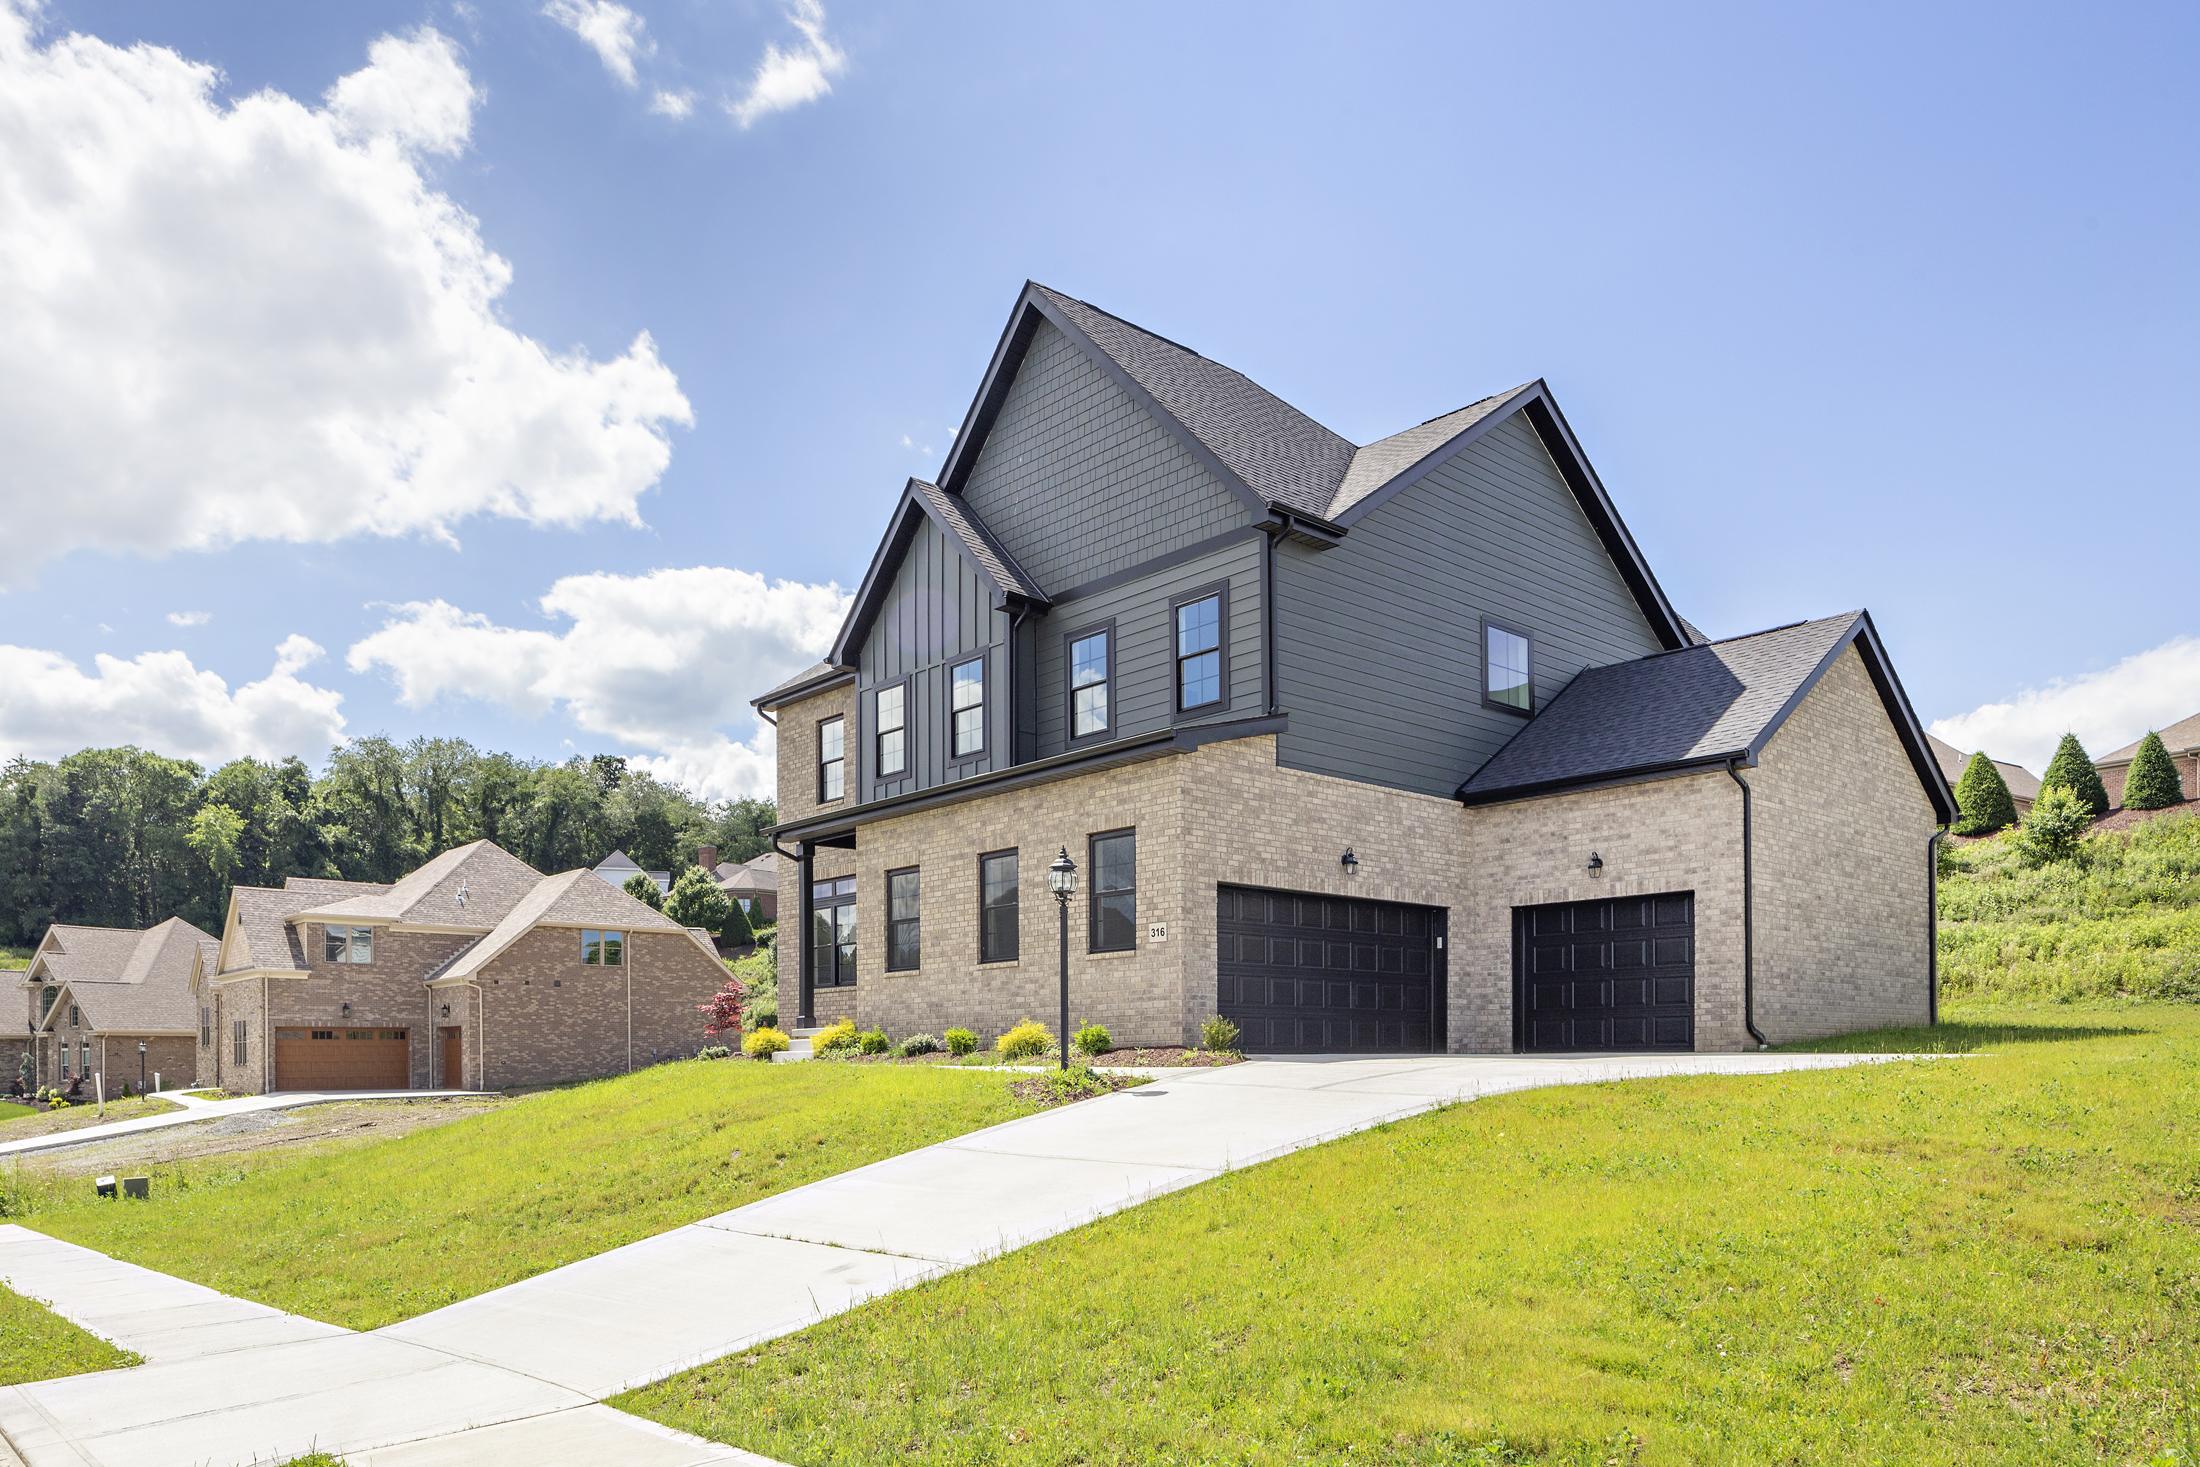 316 Spindle CourtNorth Strabane Twp - 2,850+ sqft. 4 bed, 3.5 bath, 3-car garage